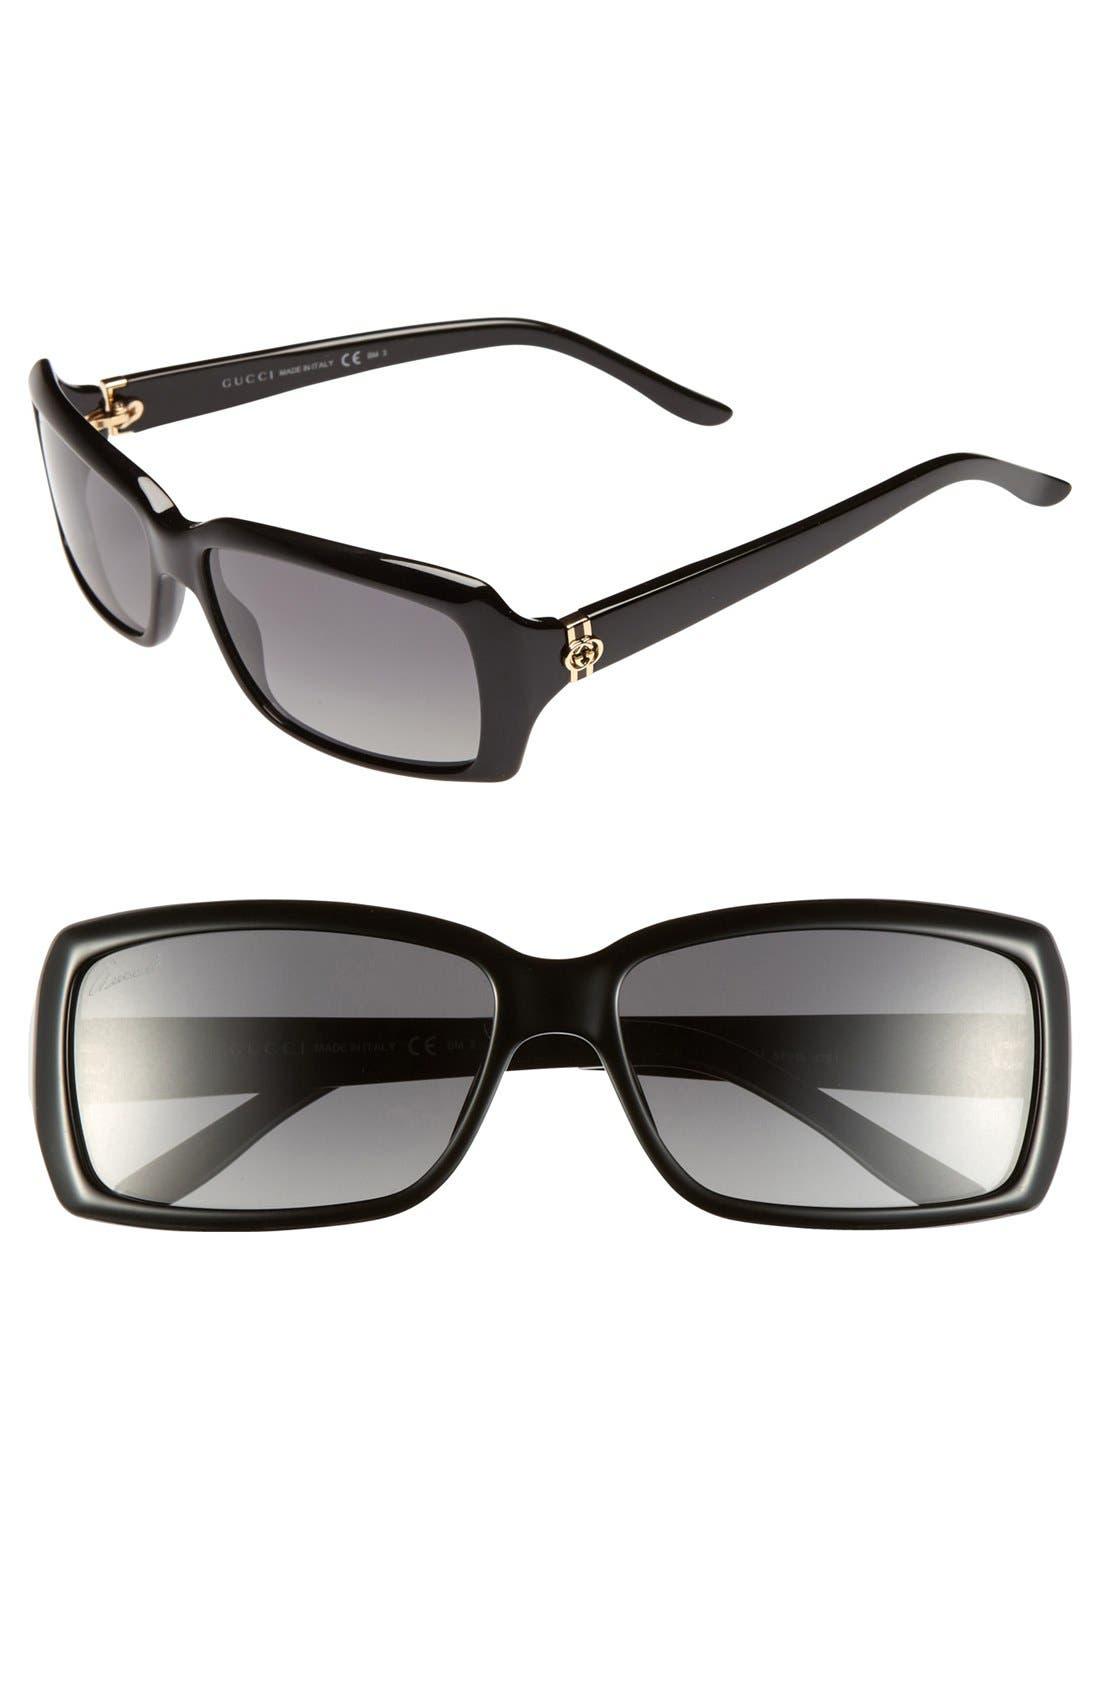 Main Image - Gucci 57mm Polarized Sunglasses